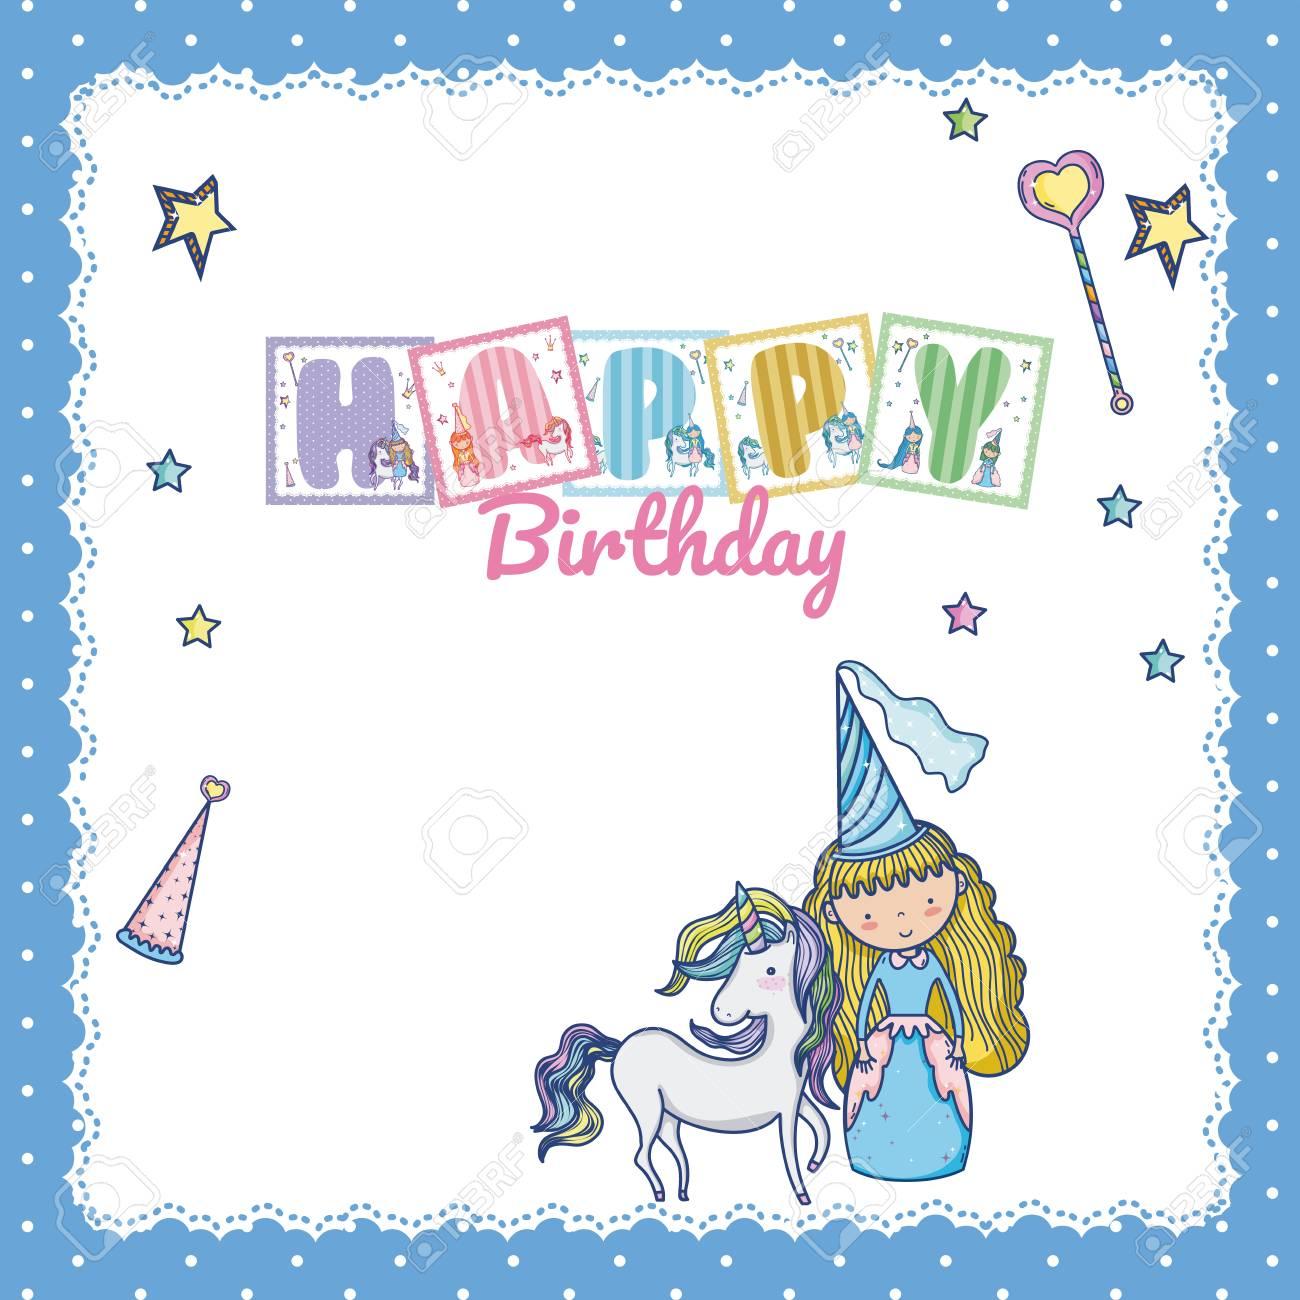 Happy Birthday Card For Little Girl Clip Art Libres De Droits